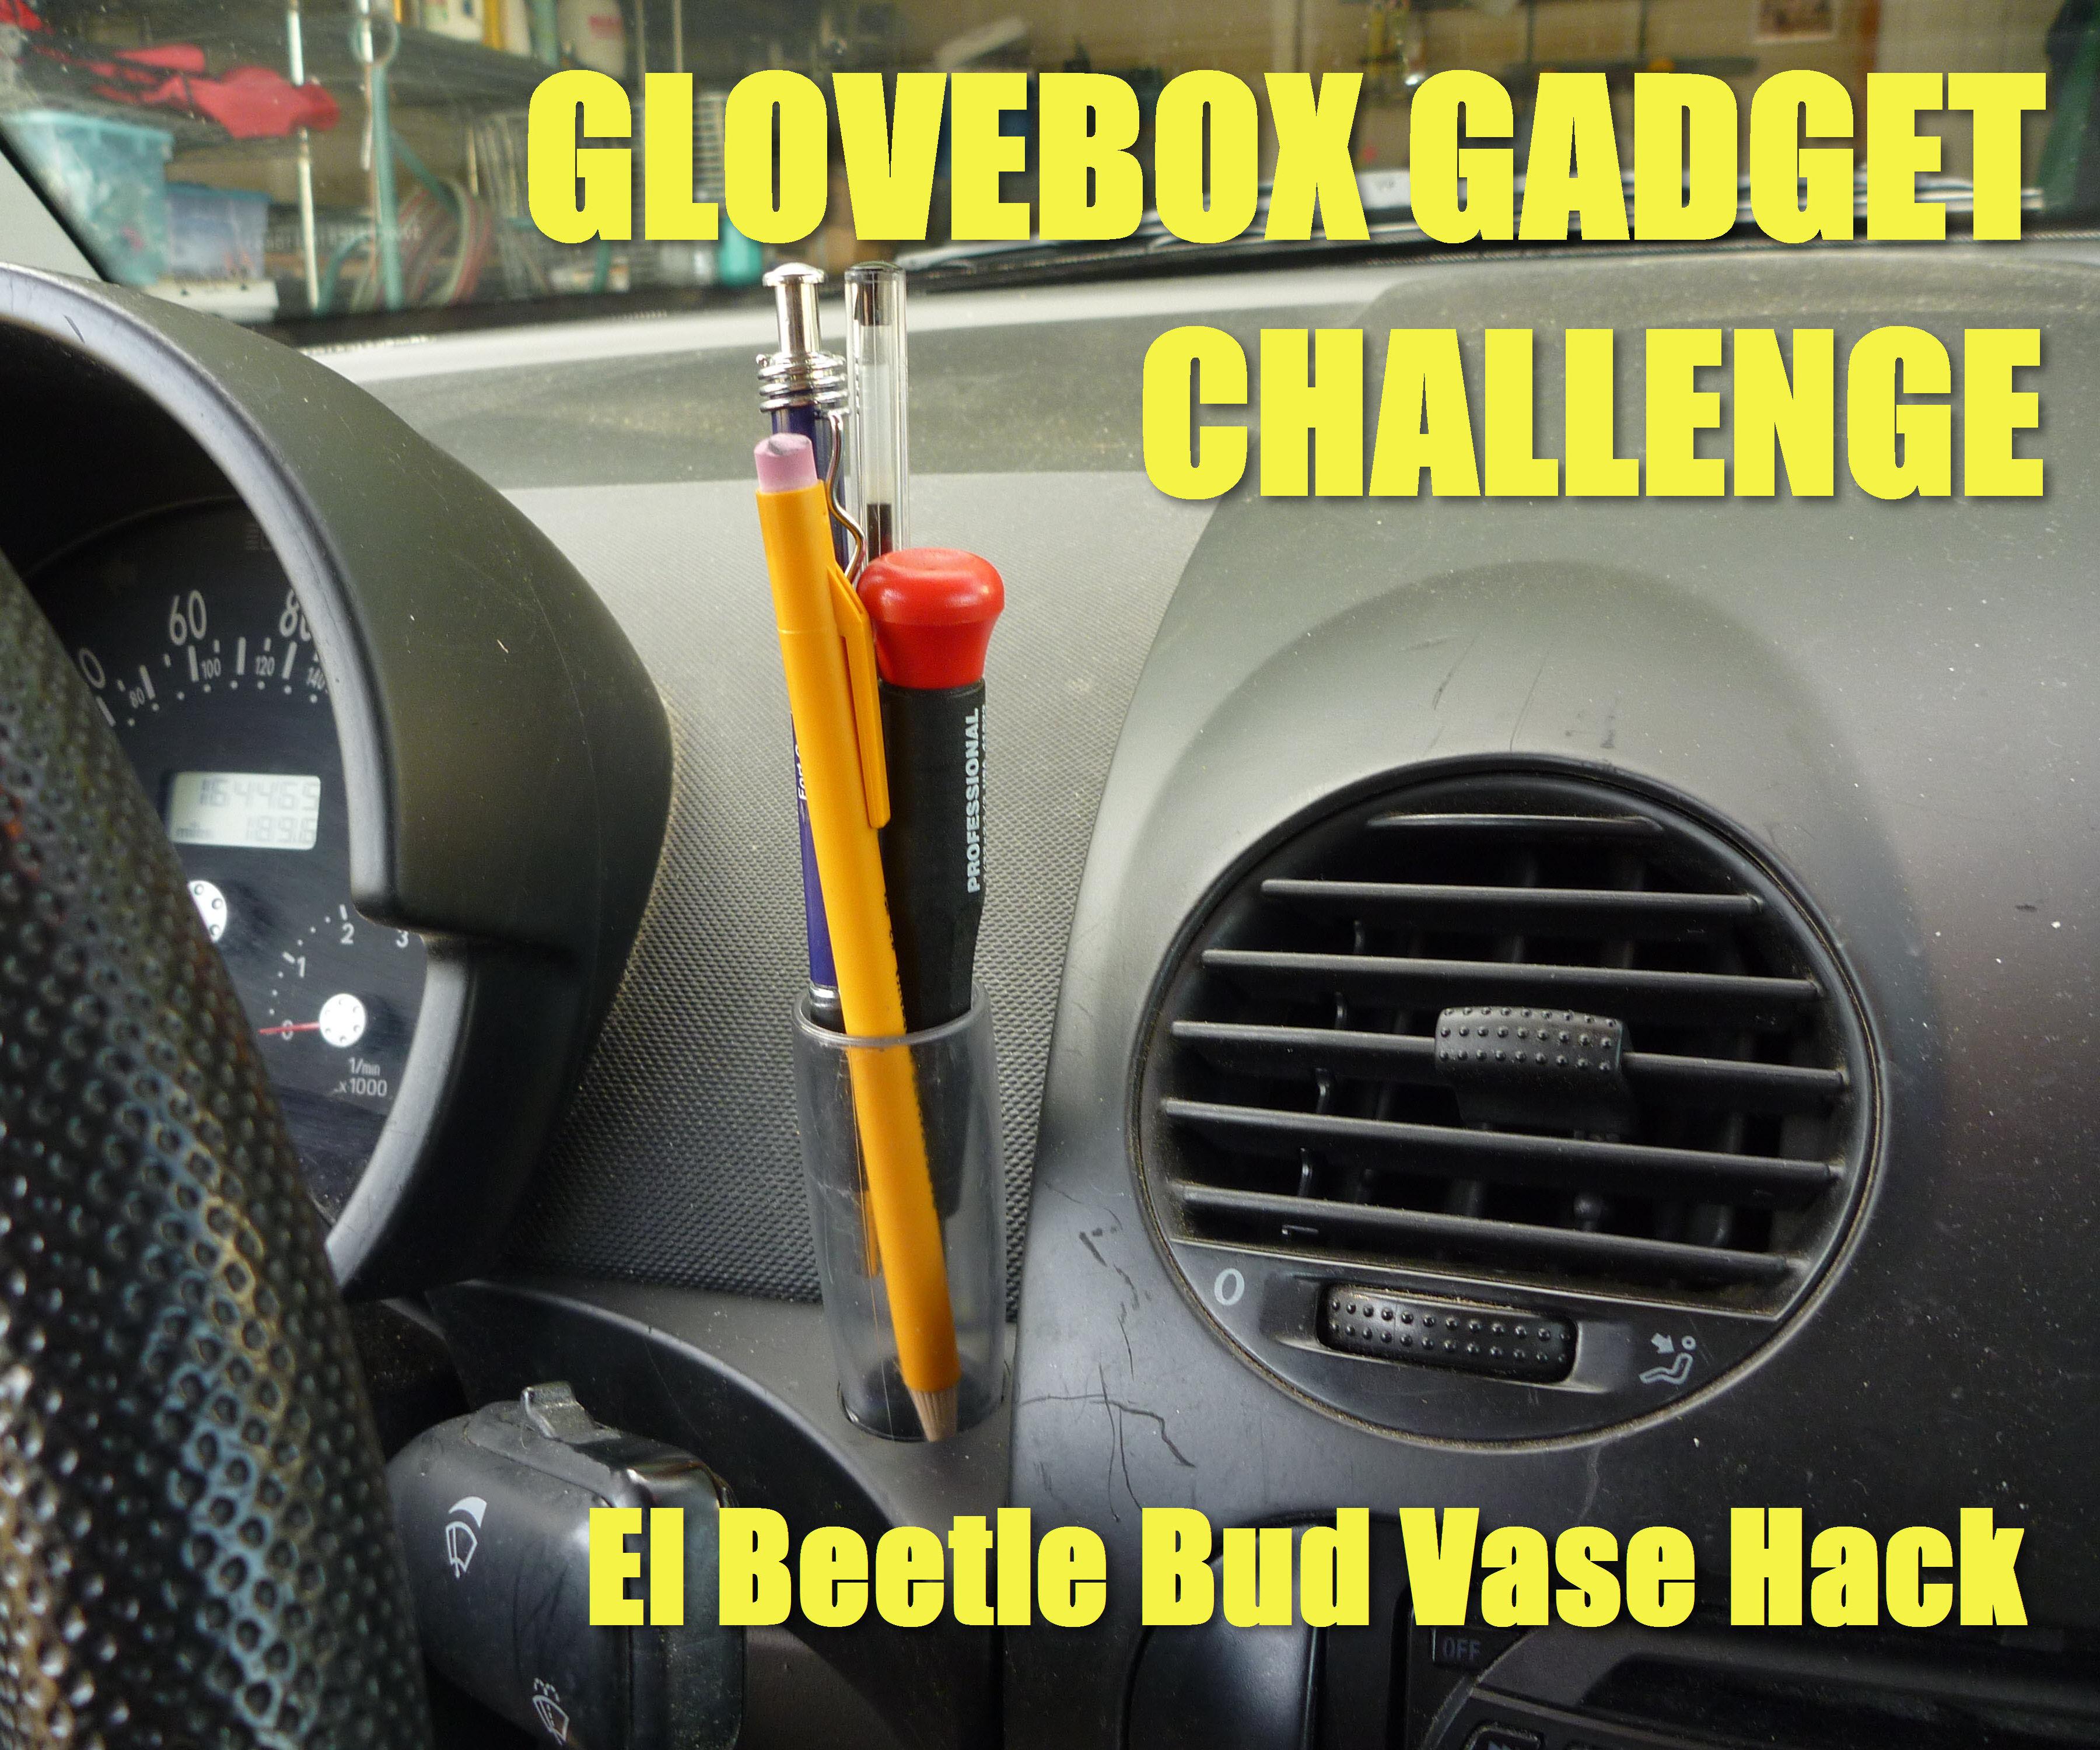 GLOVEBOX GADGET CHALLENGE - El Beetle Bud Vase Hack